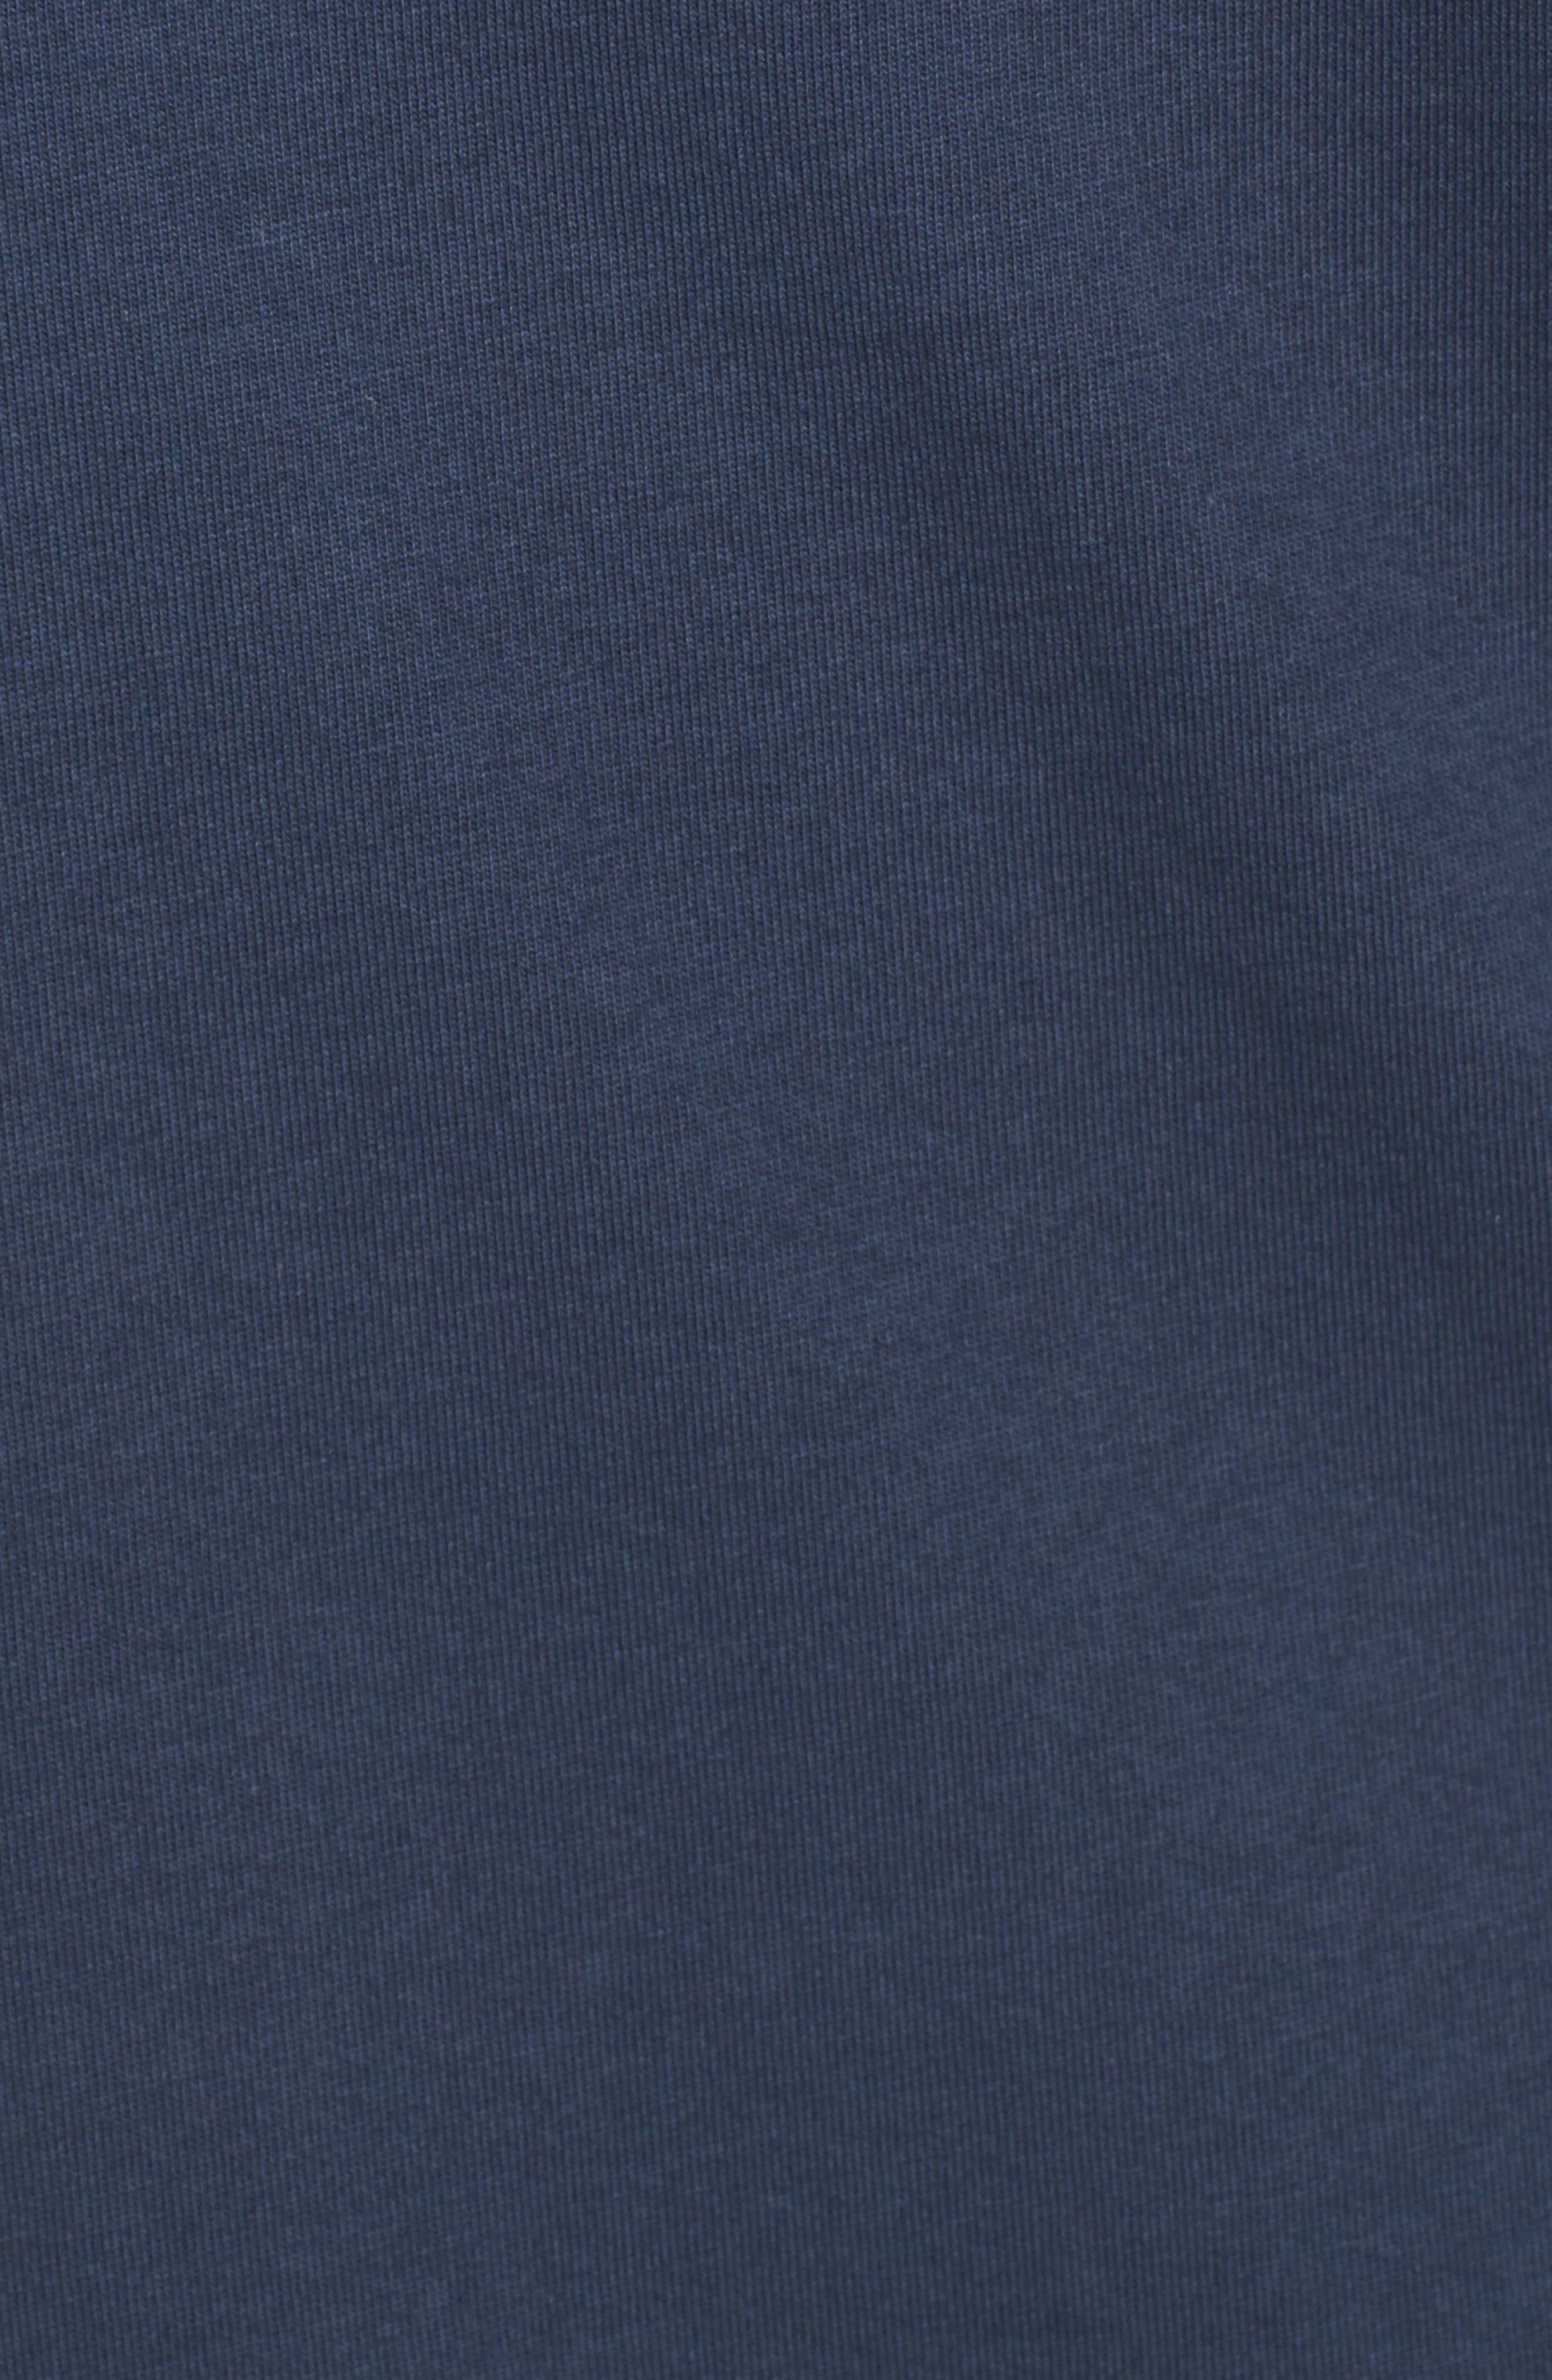 Whale Print Long Sleeve Tee,                             Alternate thumbnail 6, color,                             406